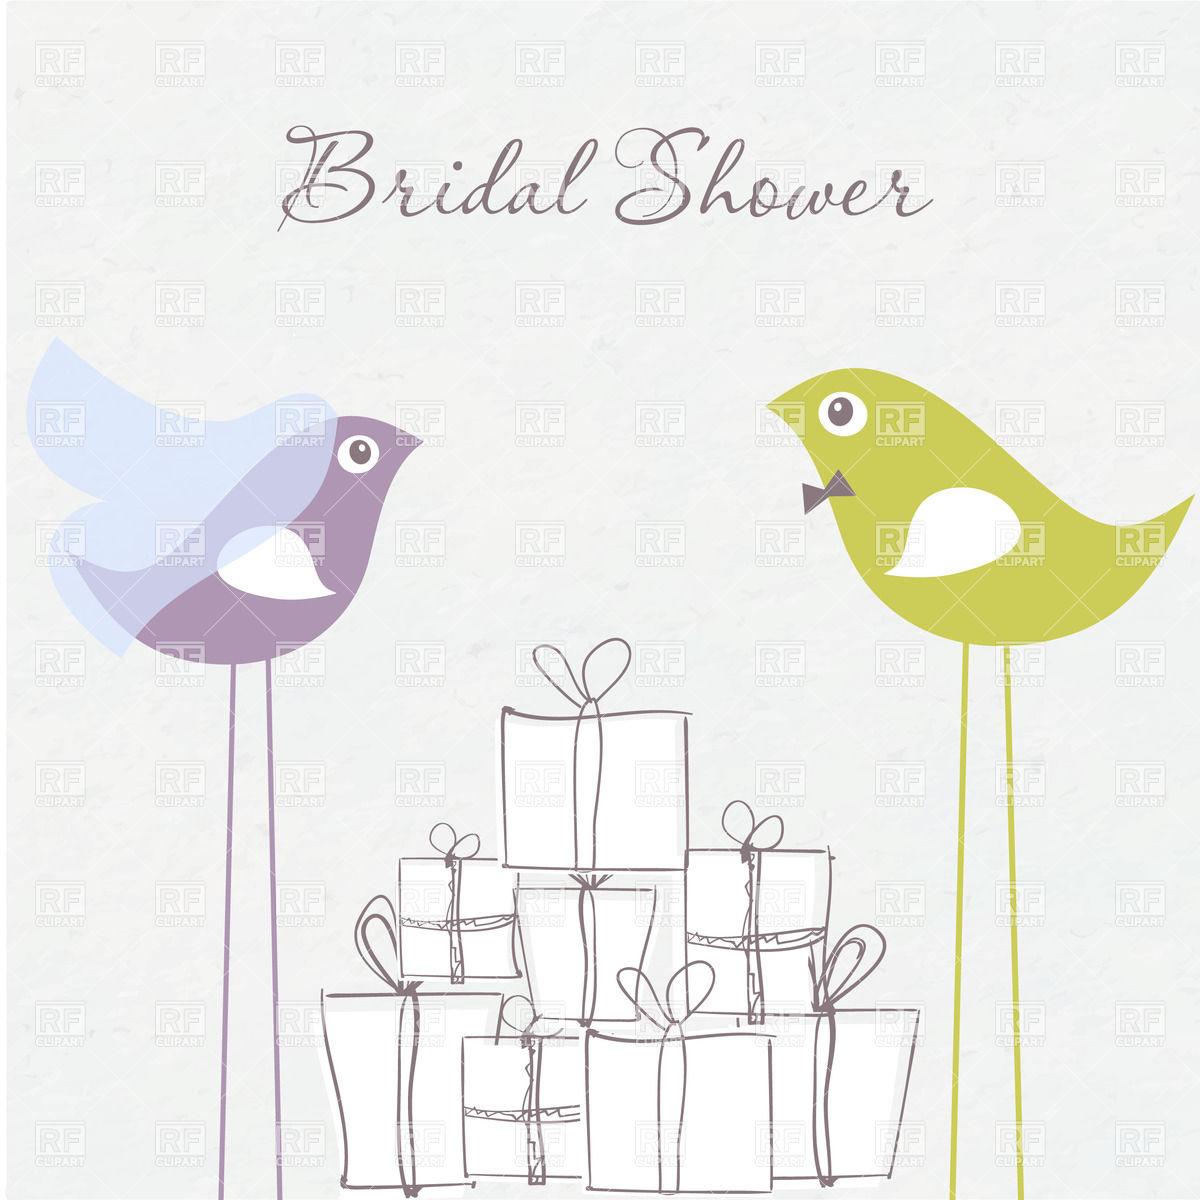 Bridal Shower Invitation Birds In Bride -Bridal Shower Invitation Birds In Bride And Groom Costumes And Gift-4